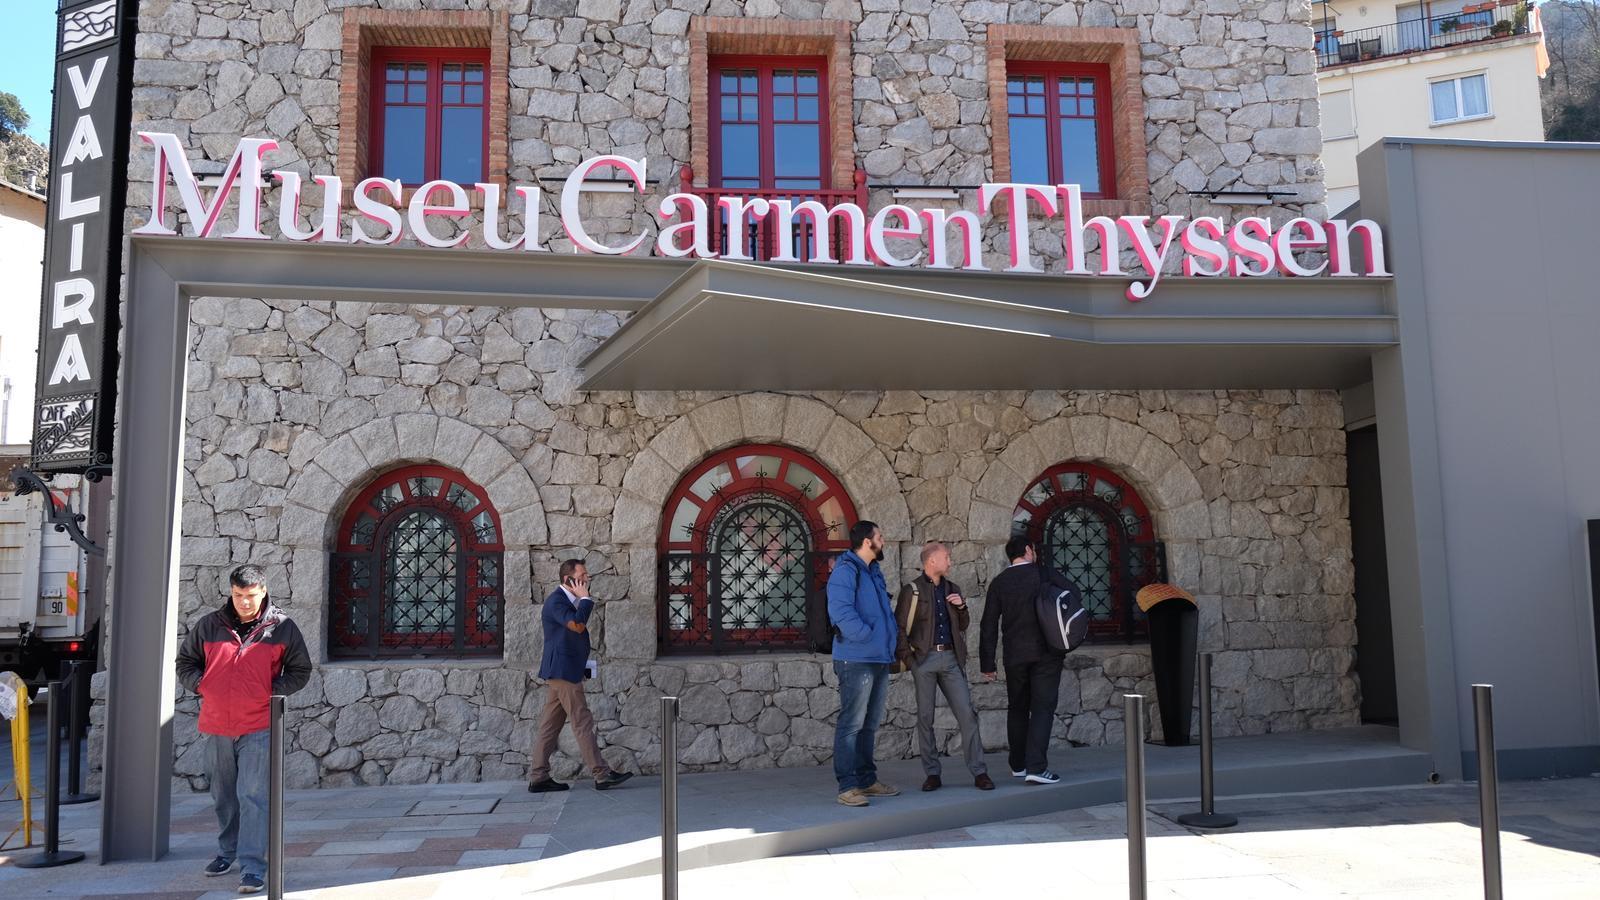 El Museu Carmen Thyssen Andorra. / ARXIU ANA